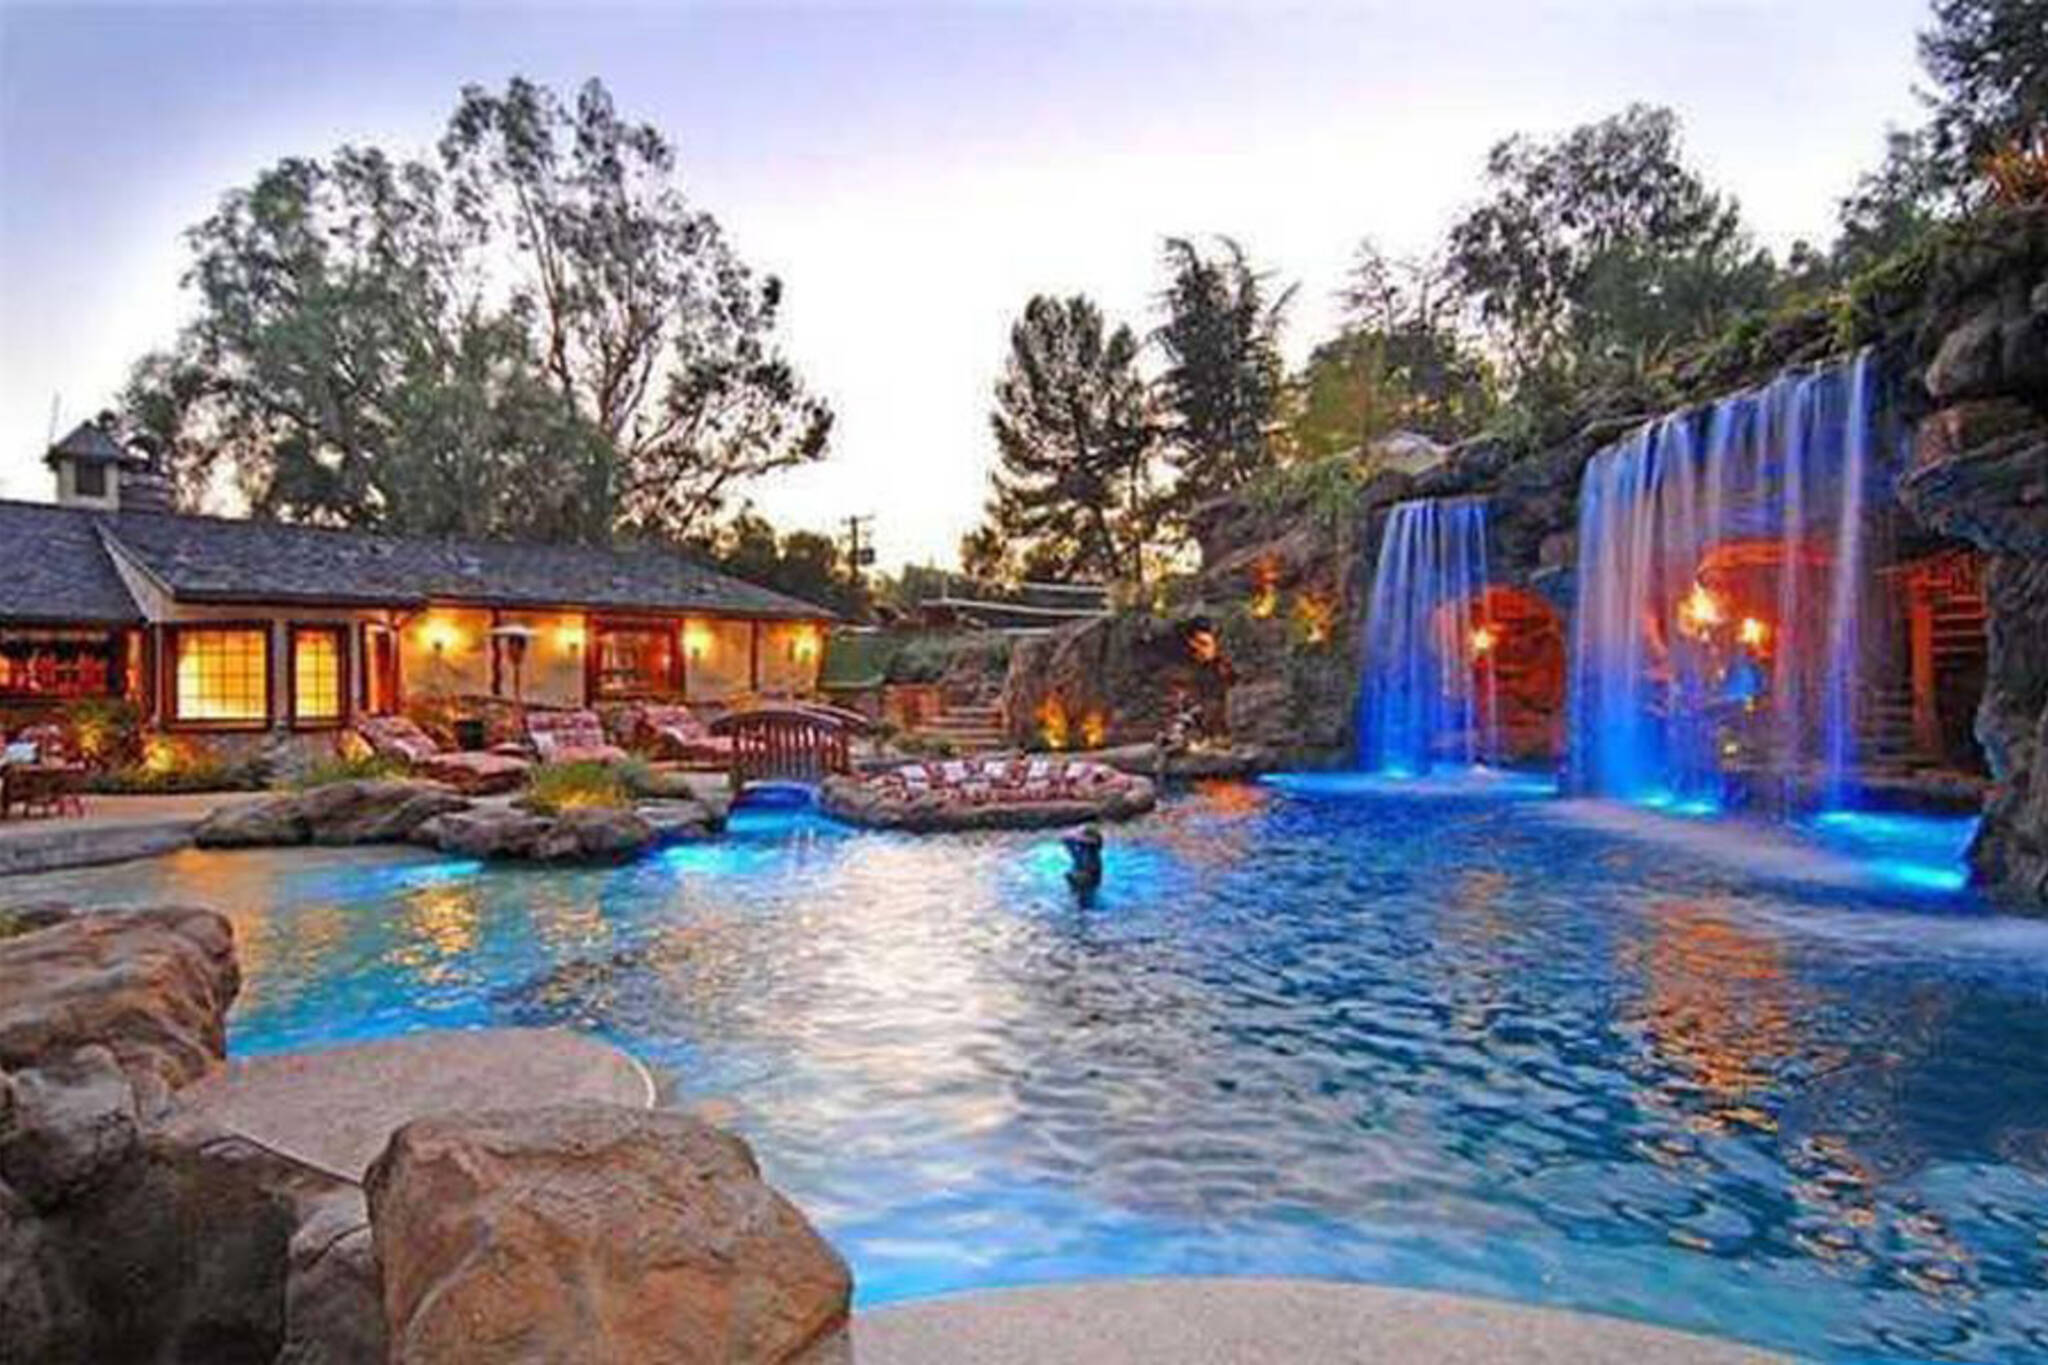 Drake LA mansion